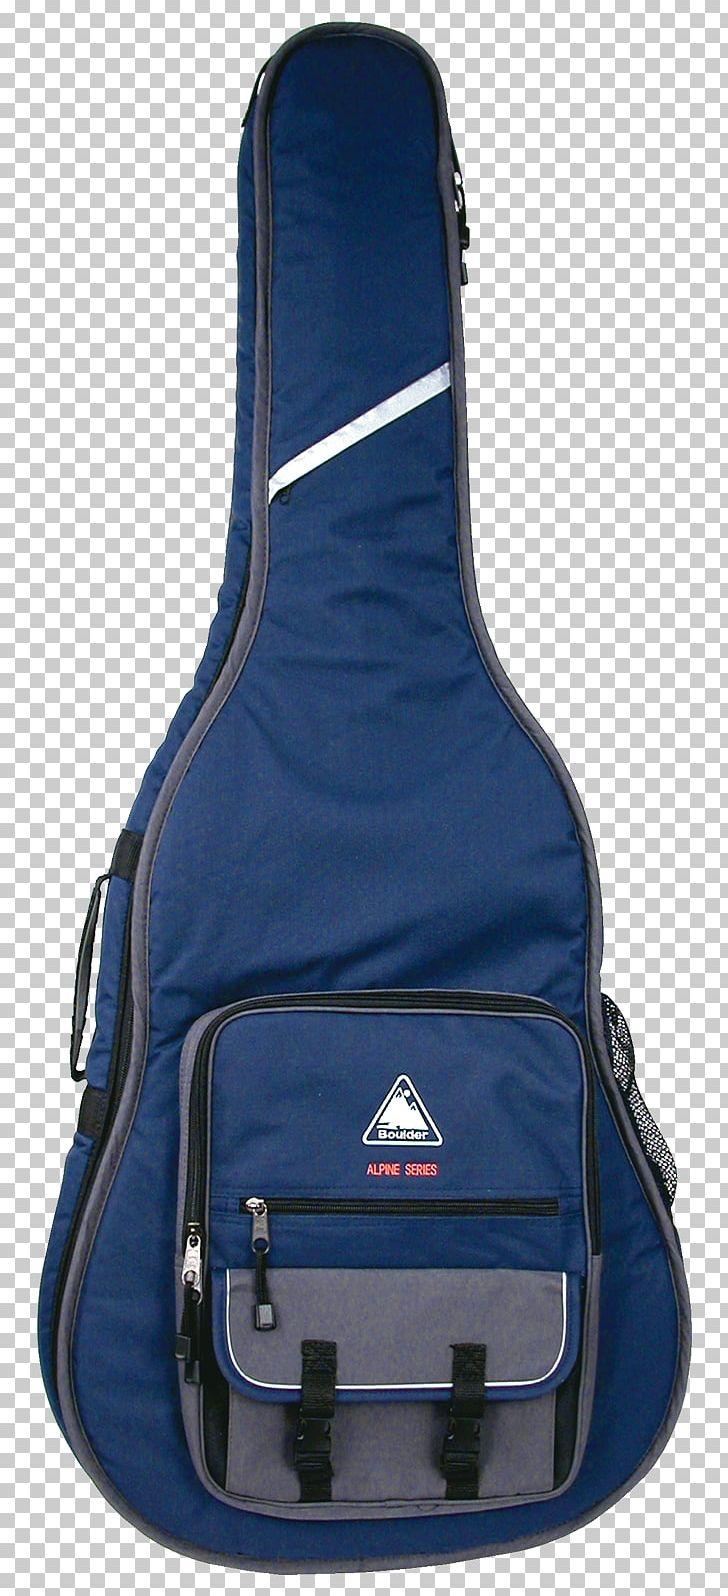 Resonator Guitar Gig Bag Acoustic Guitar Musical Instruments PNG, Clipart, Acoustic , Acoustic Guitar, Blue, Electric Blue, Gig Bag Free PNG Download